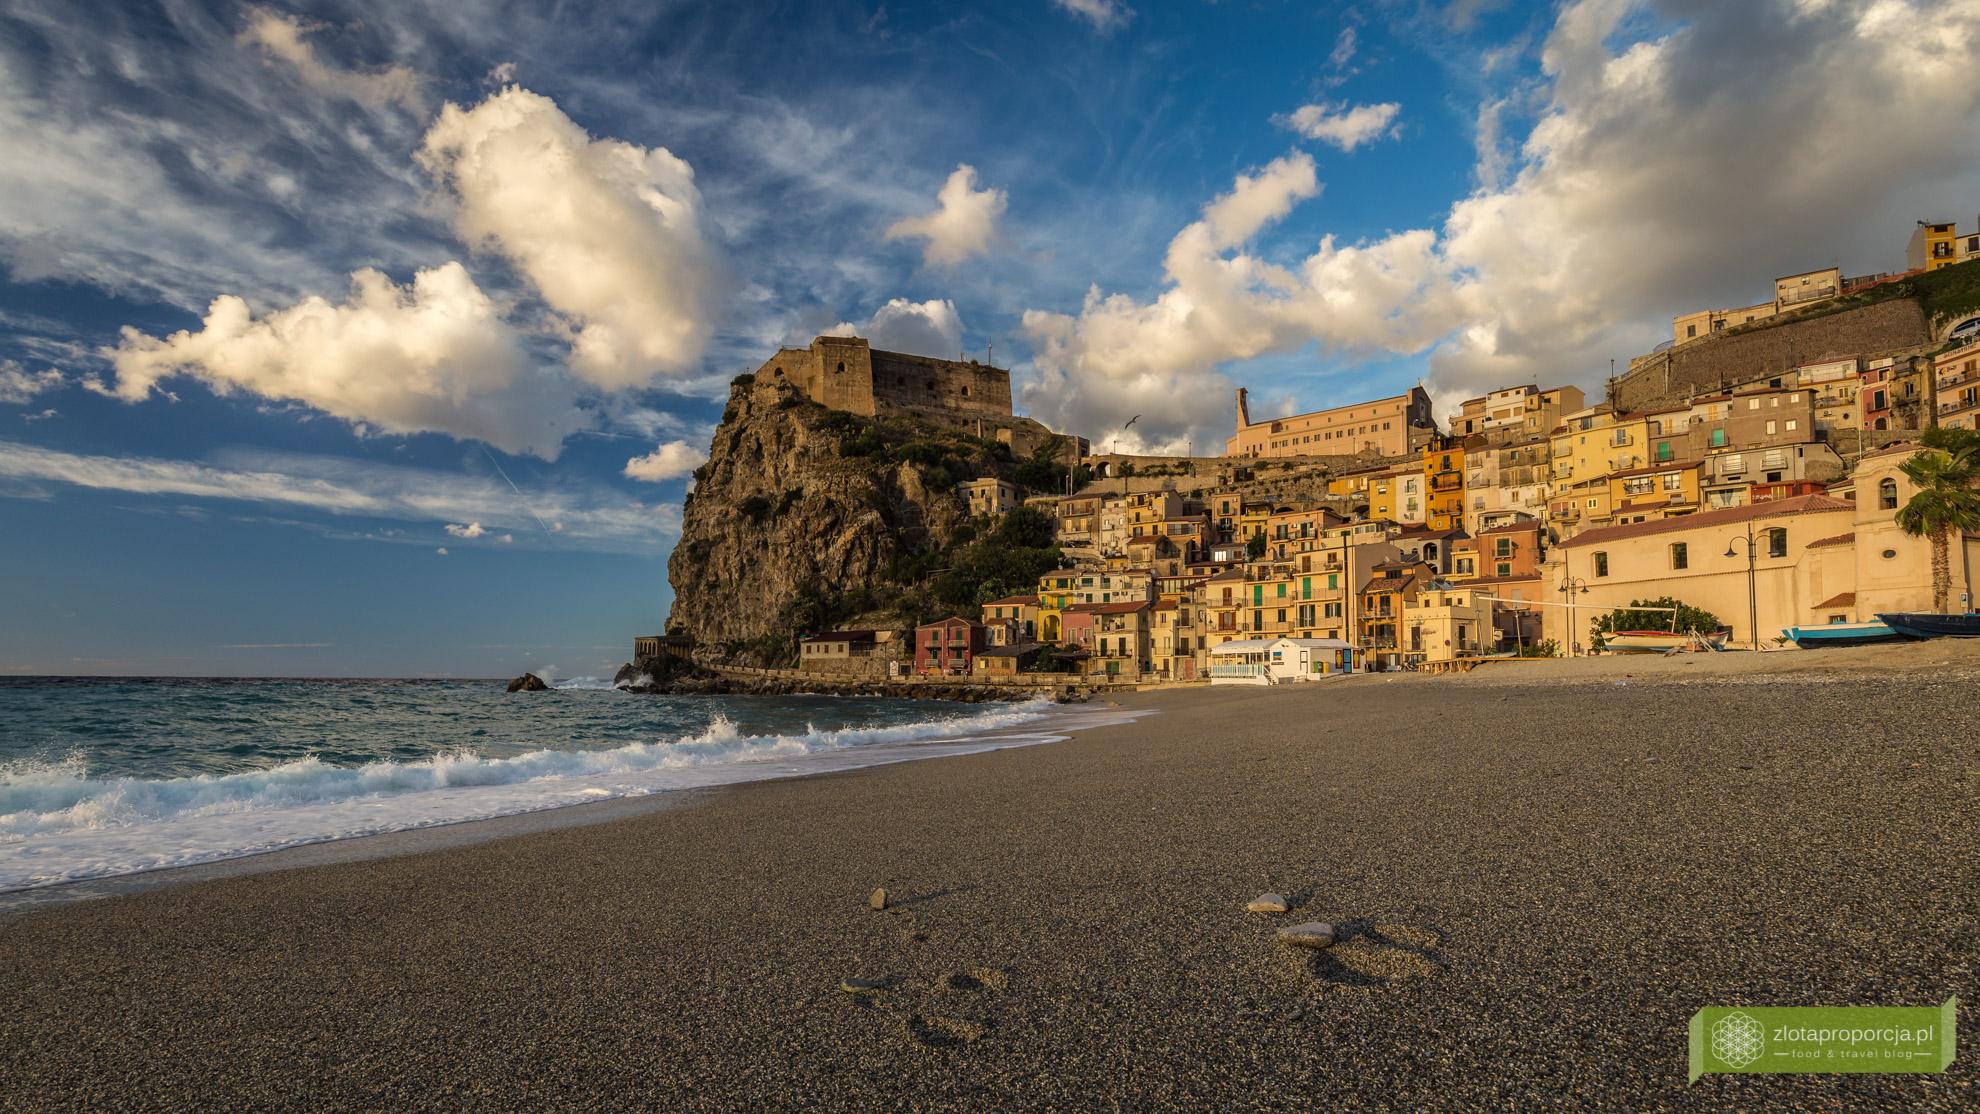 Scilla, Kalabria, Scilla atrakcje, Scilla co zobaczyć, Chianalea, Włochy, Kalabria atrakcje, Castello Ruffo, plaża w Scilli